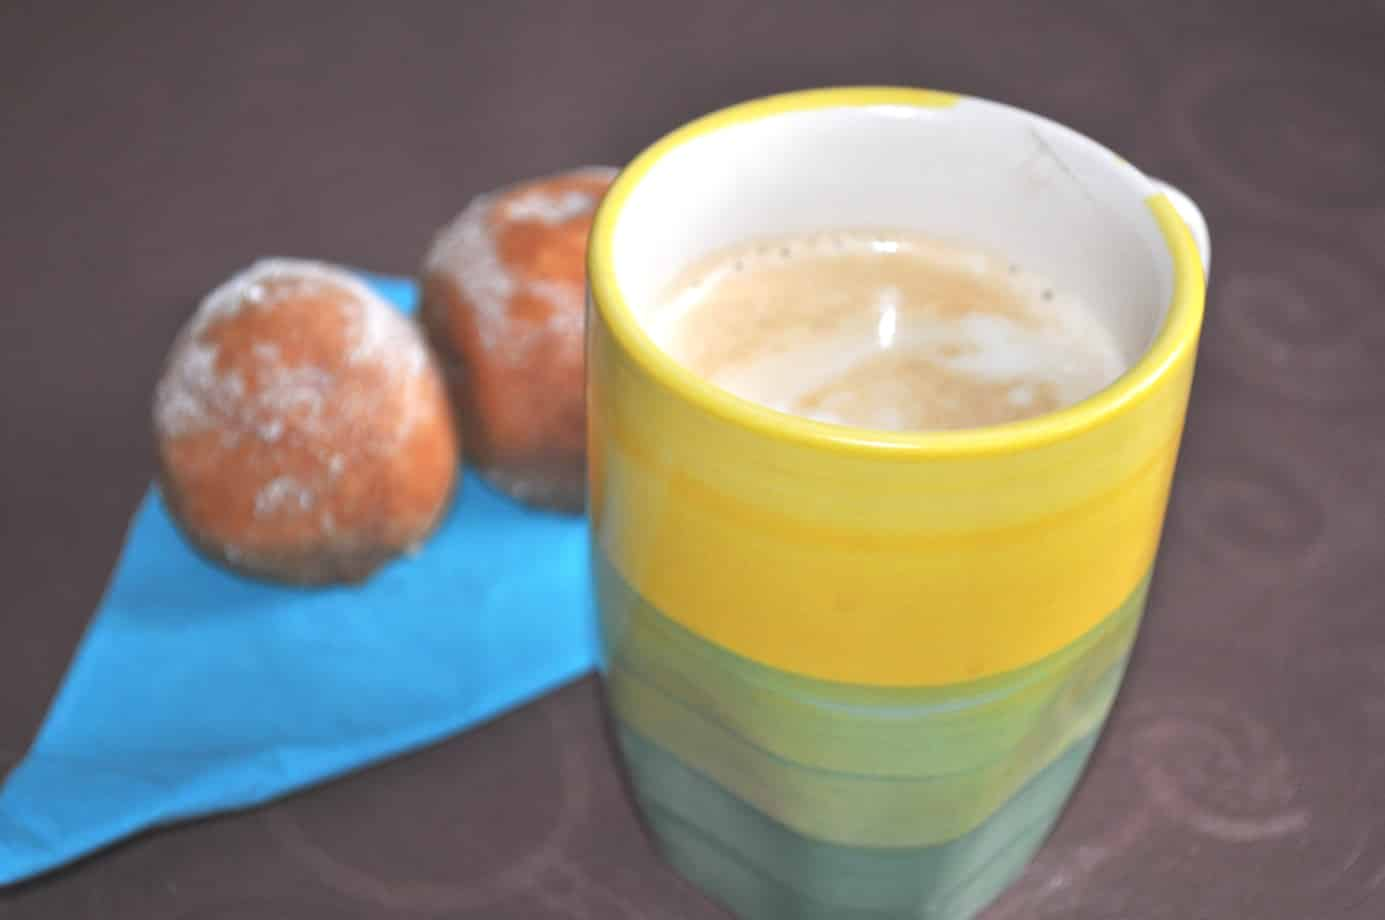 Legga Kaffee mit Quarkbällchen